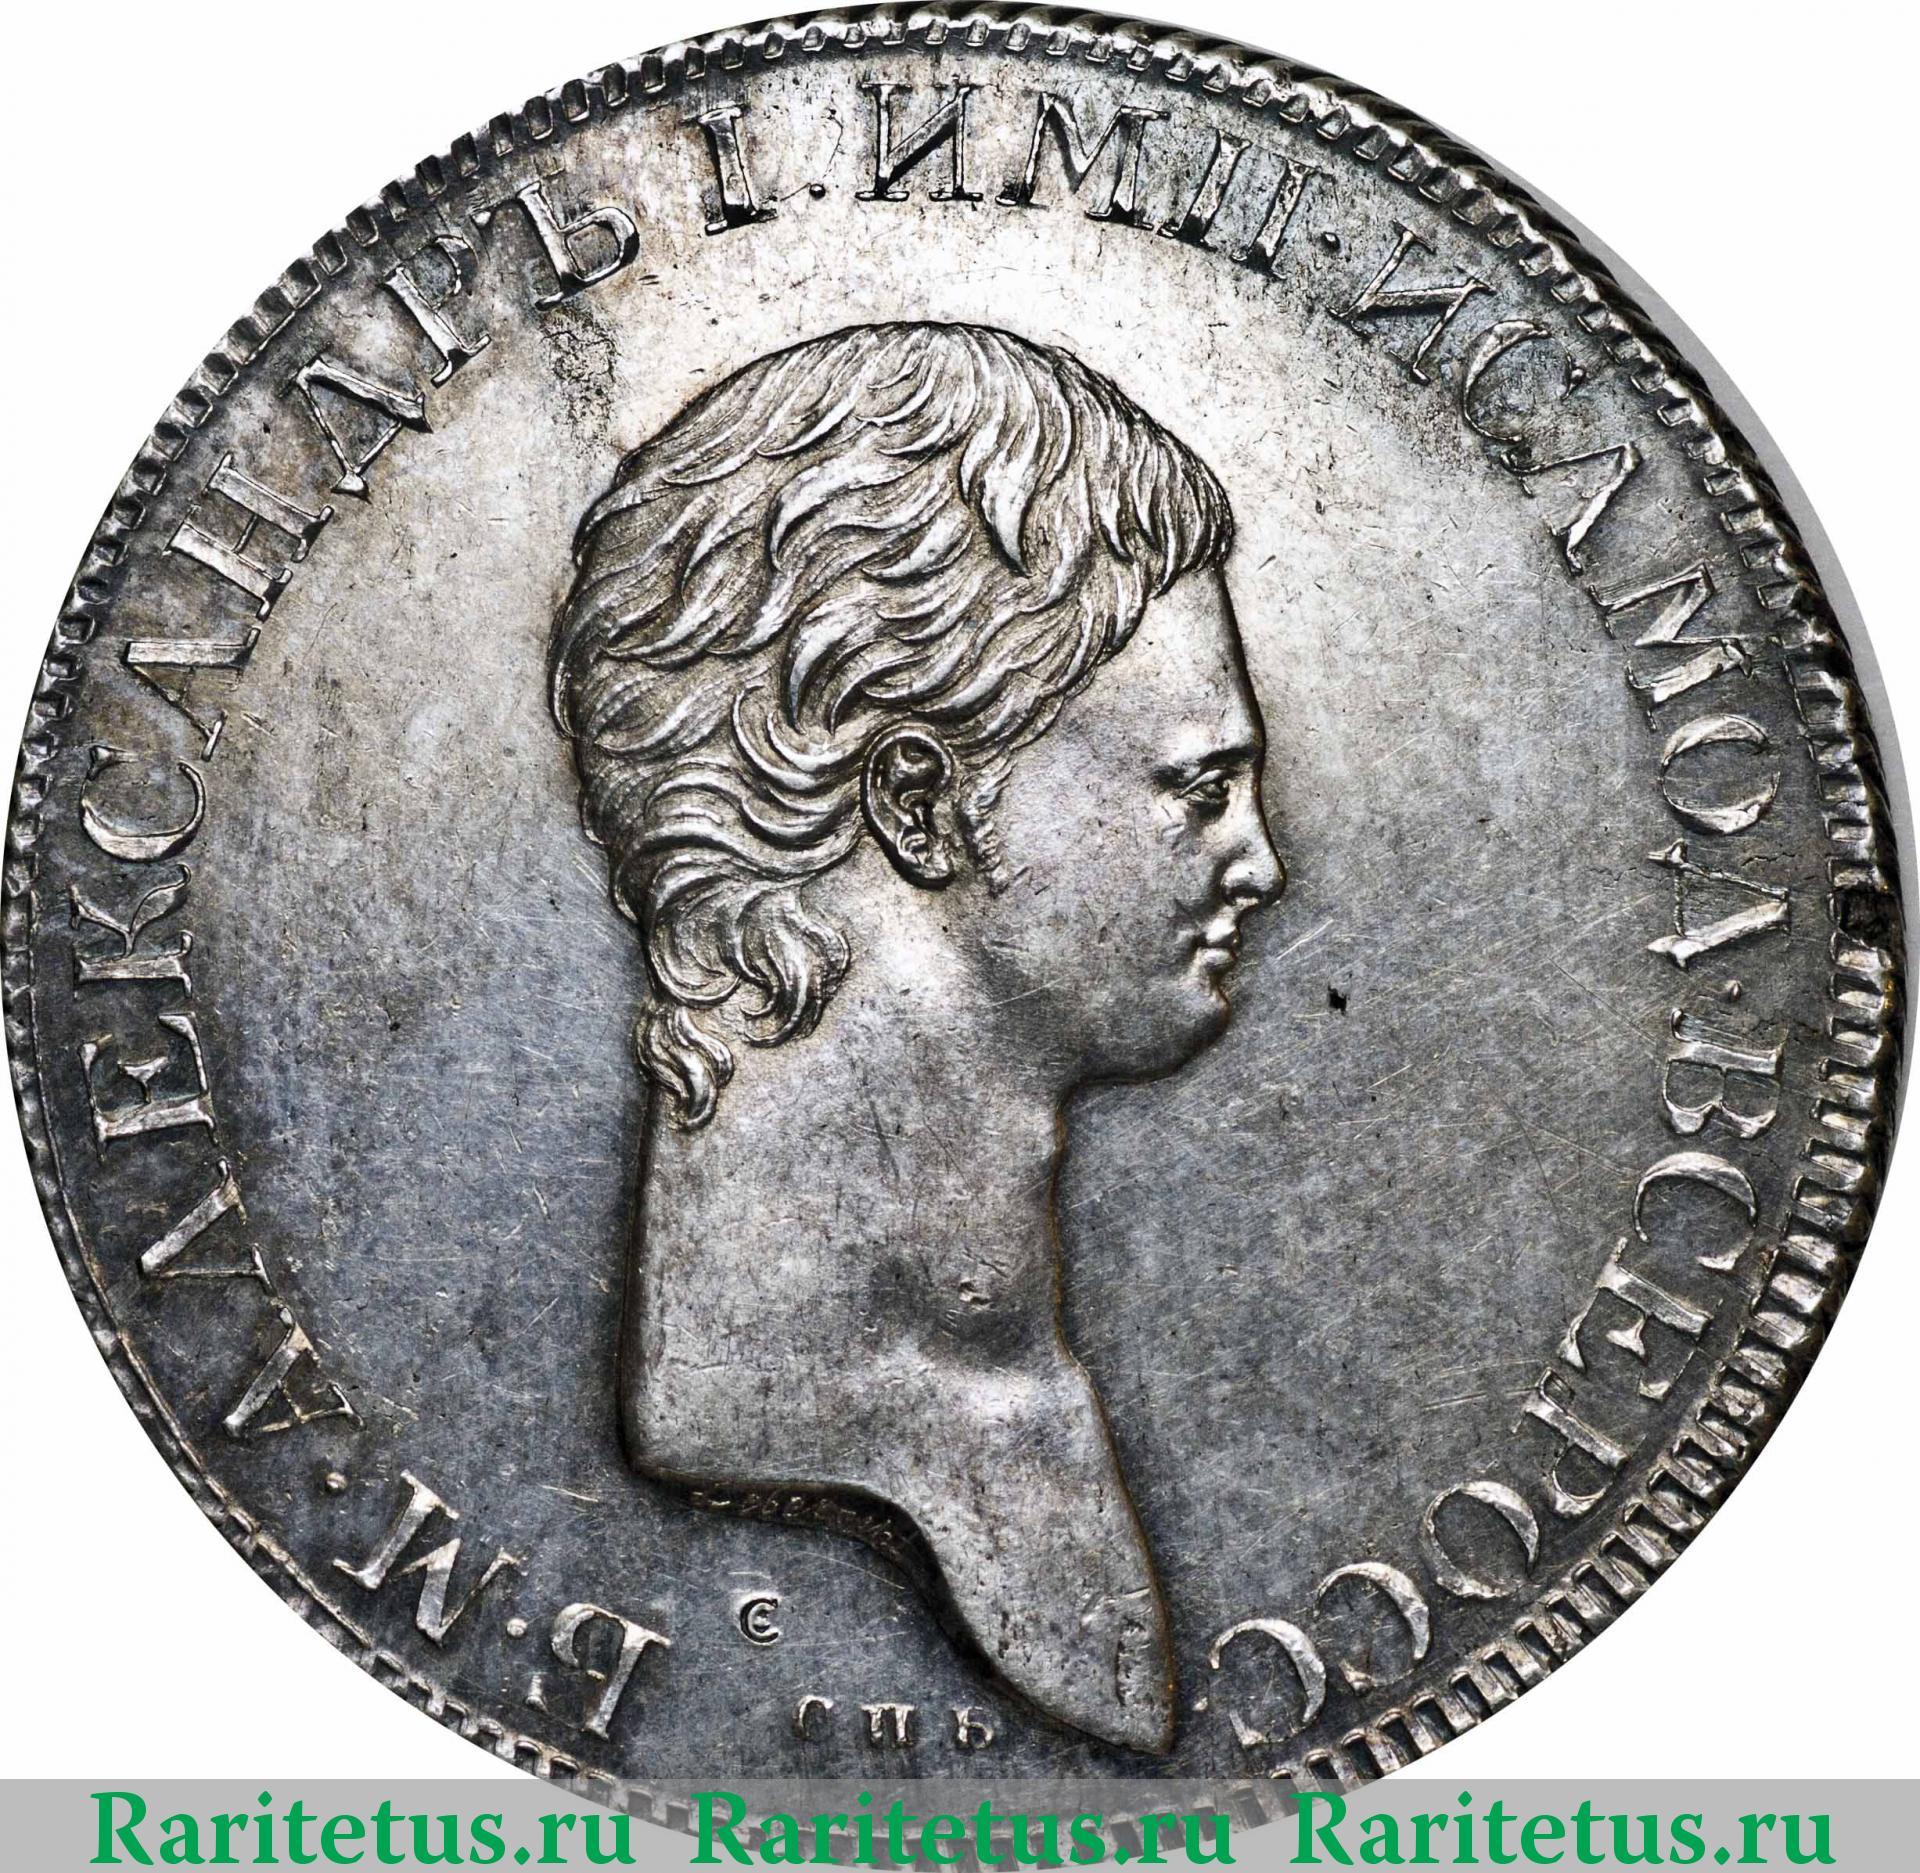 Монета рубль 1801 года цена александр 1 пробный рубль 1766 года